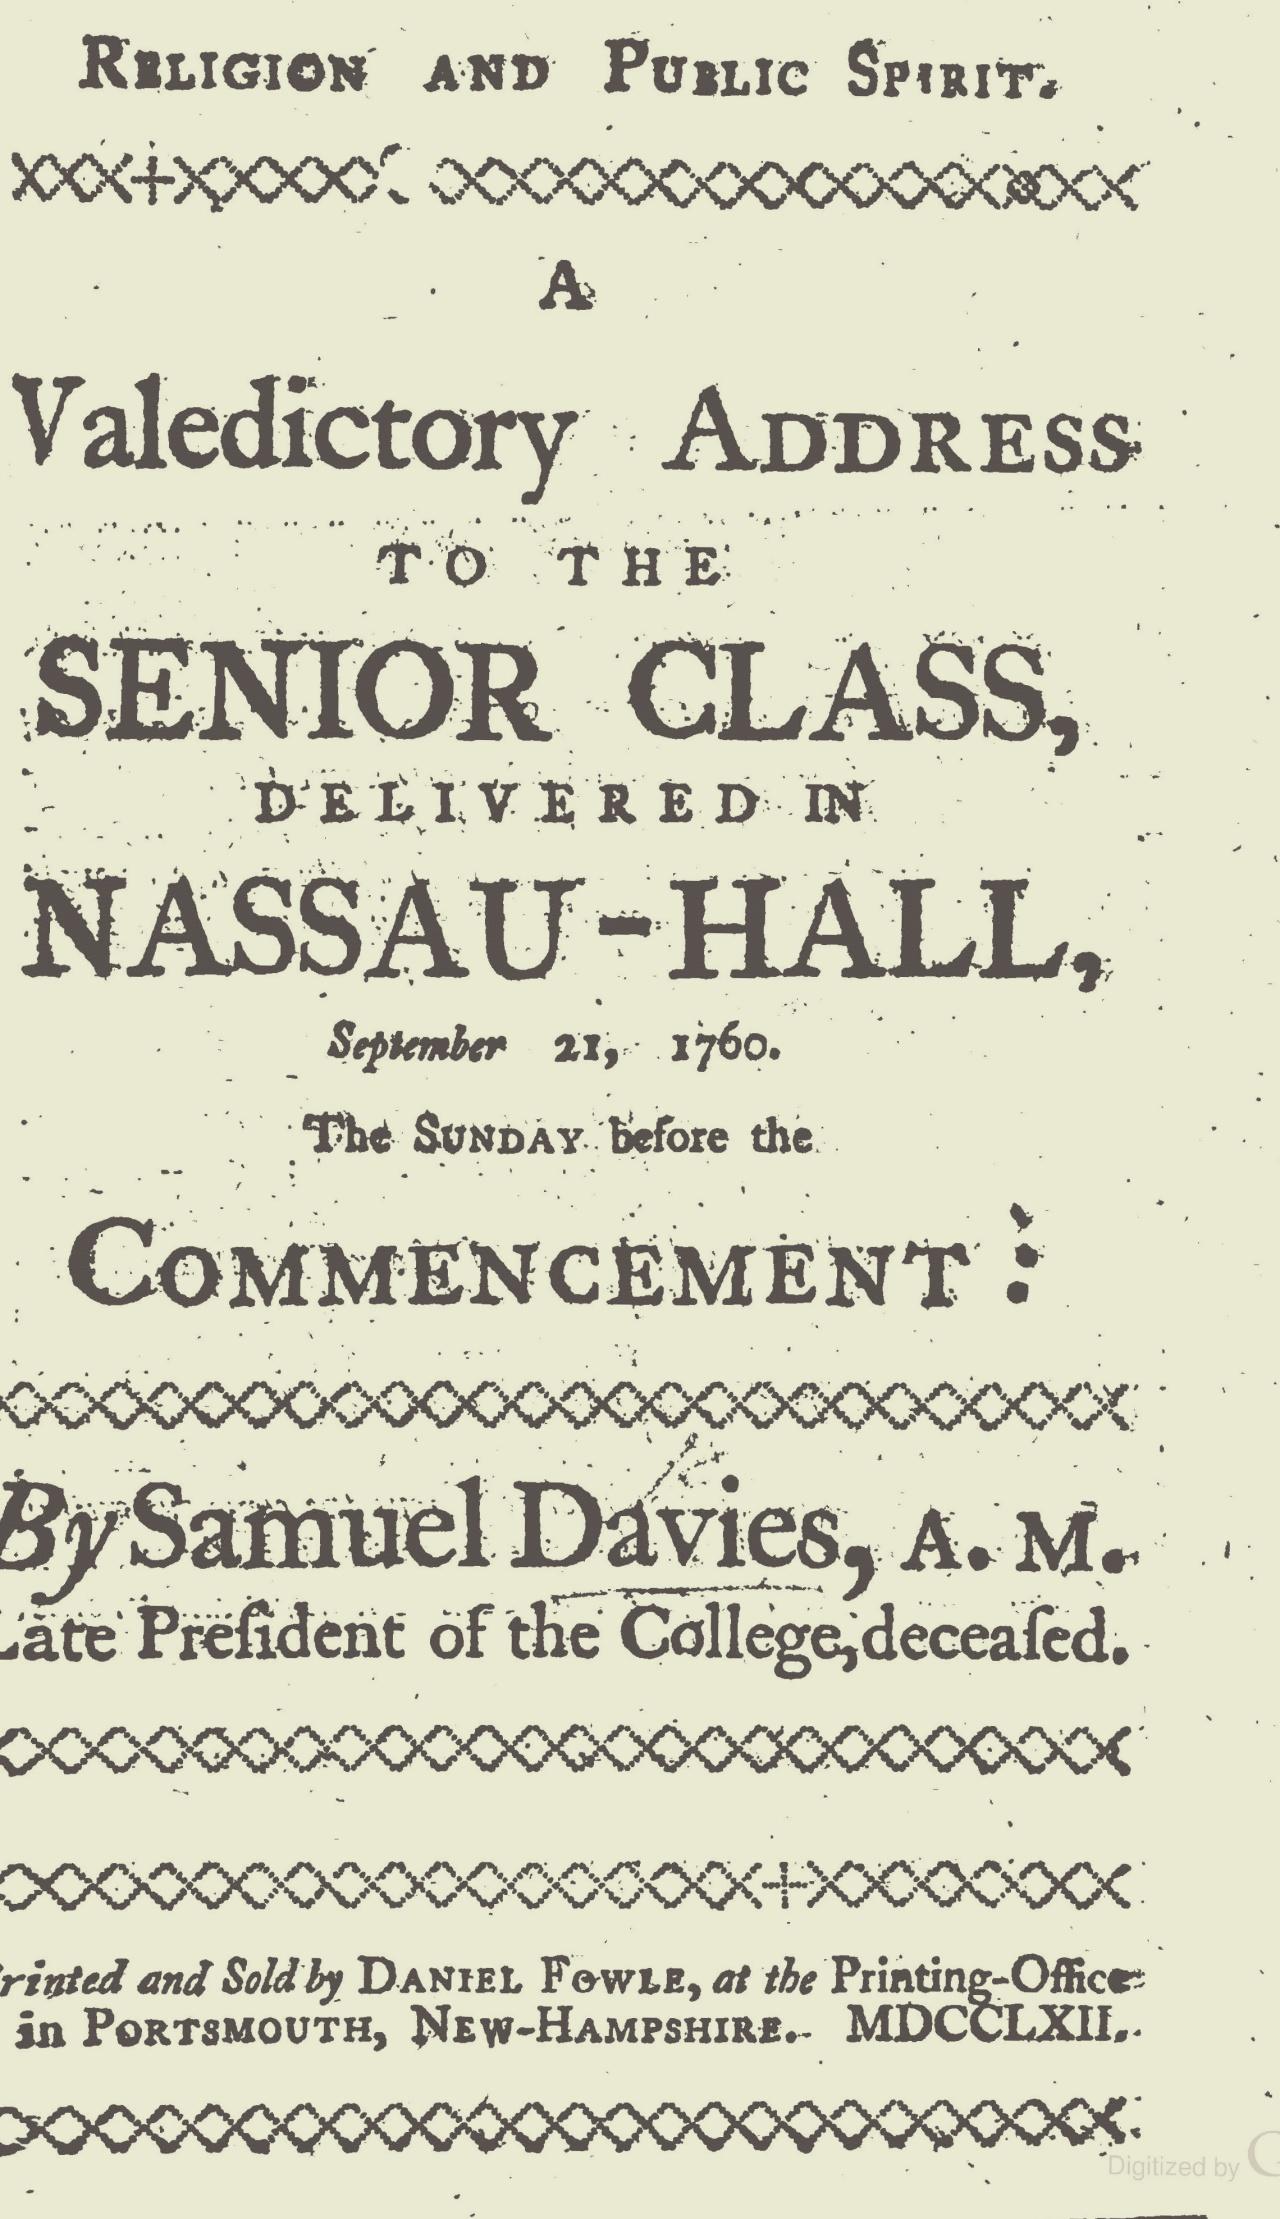 Davies, Samuel, Religion and Public Spirit Title Page.jpg